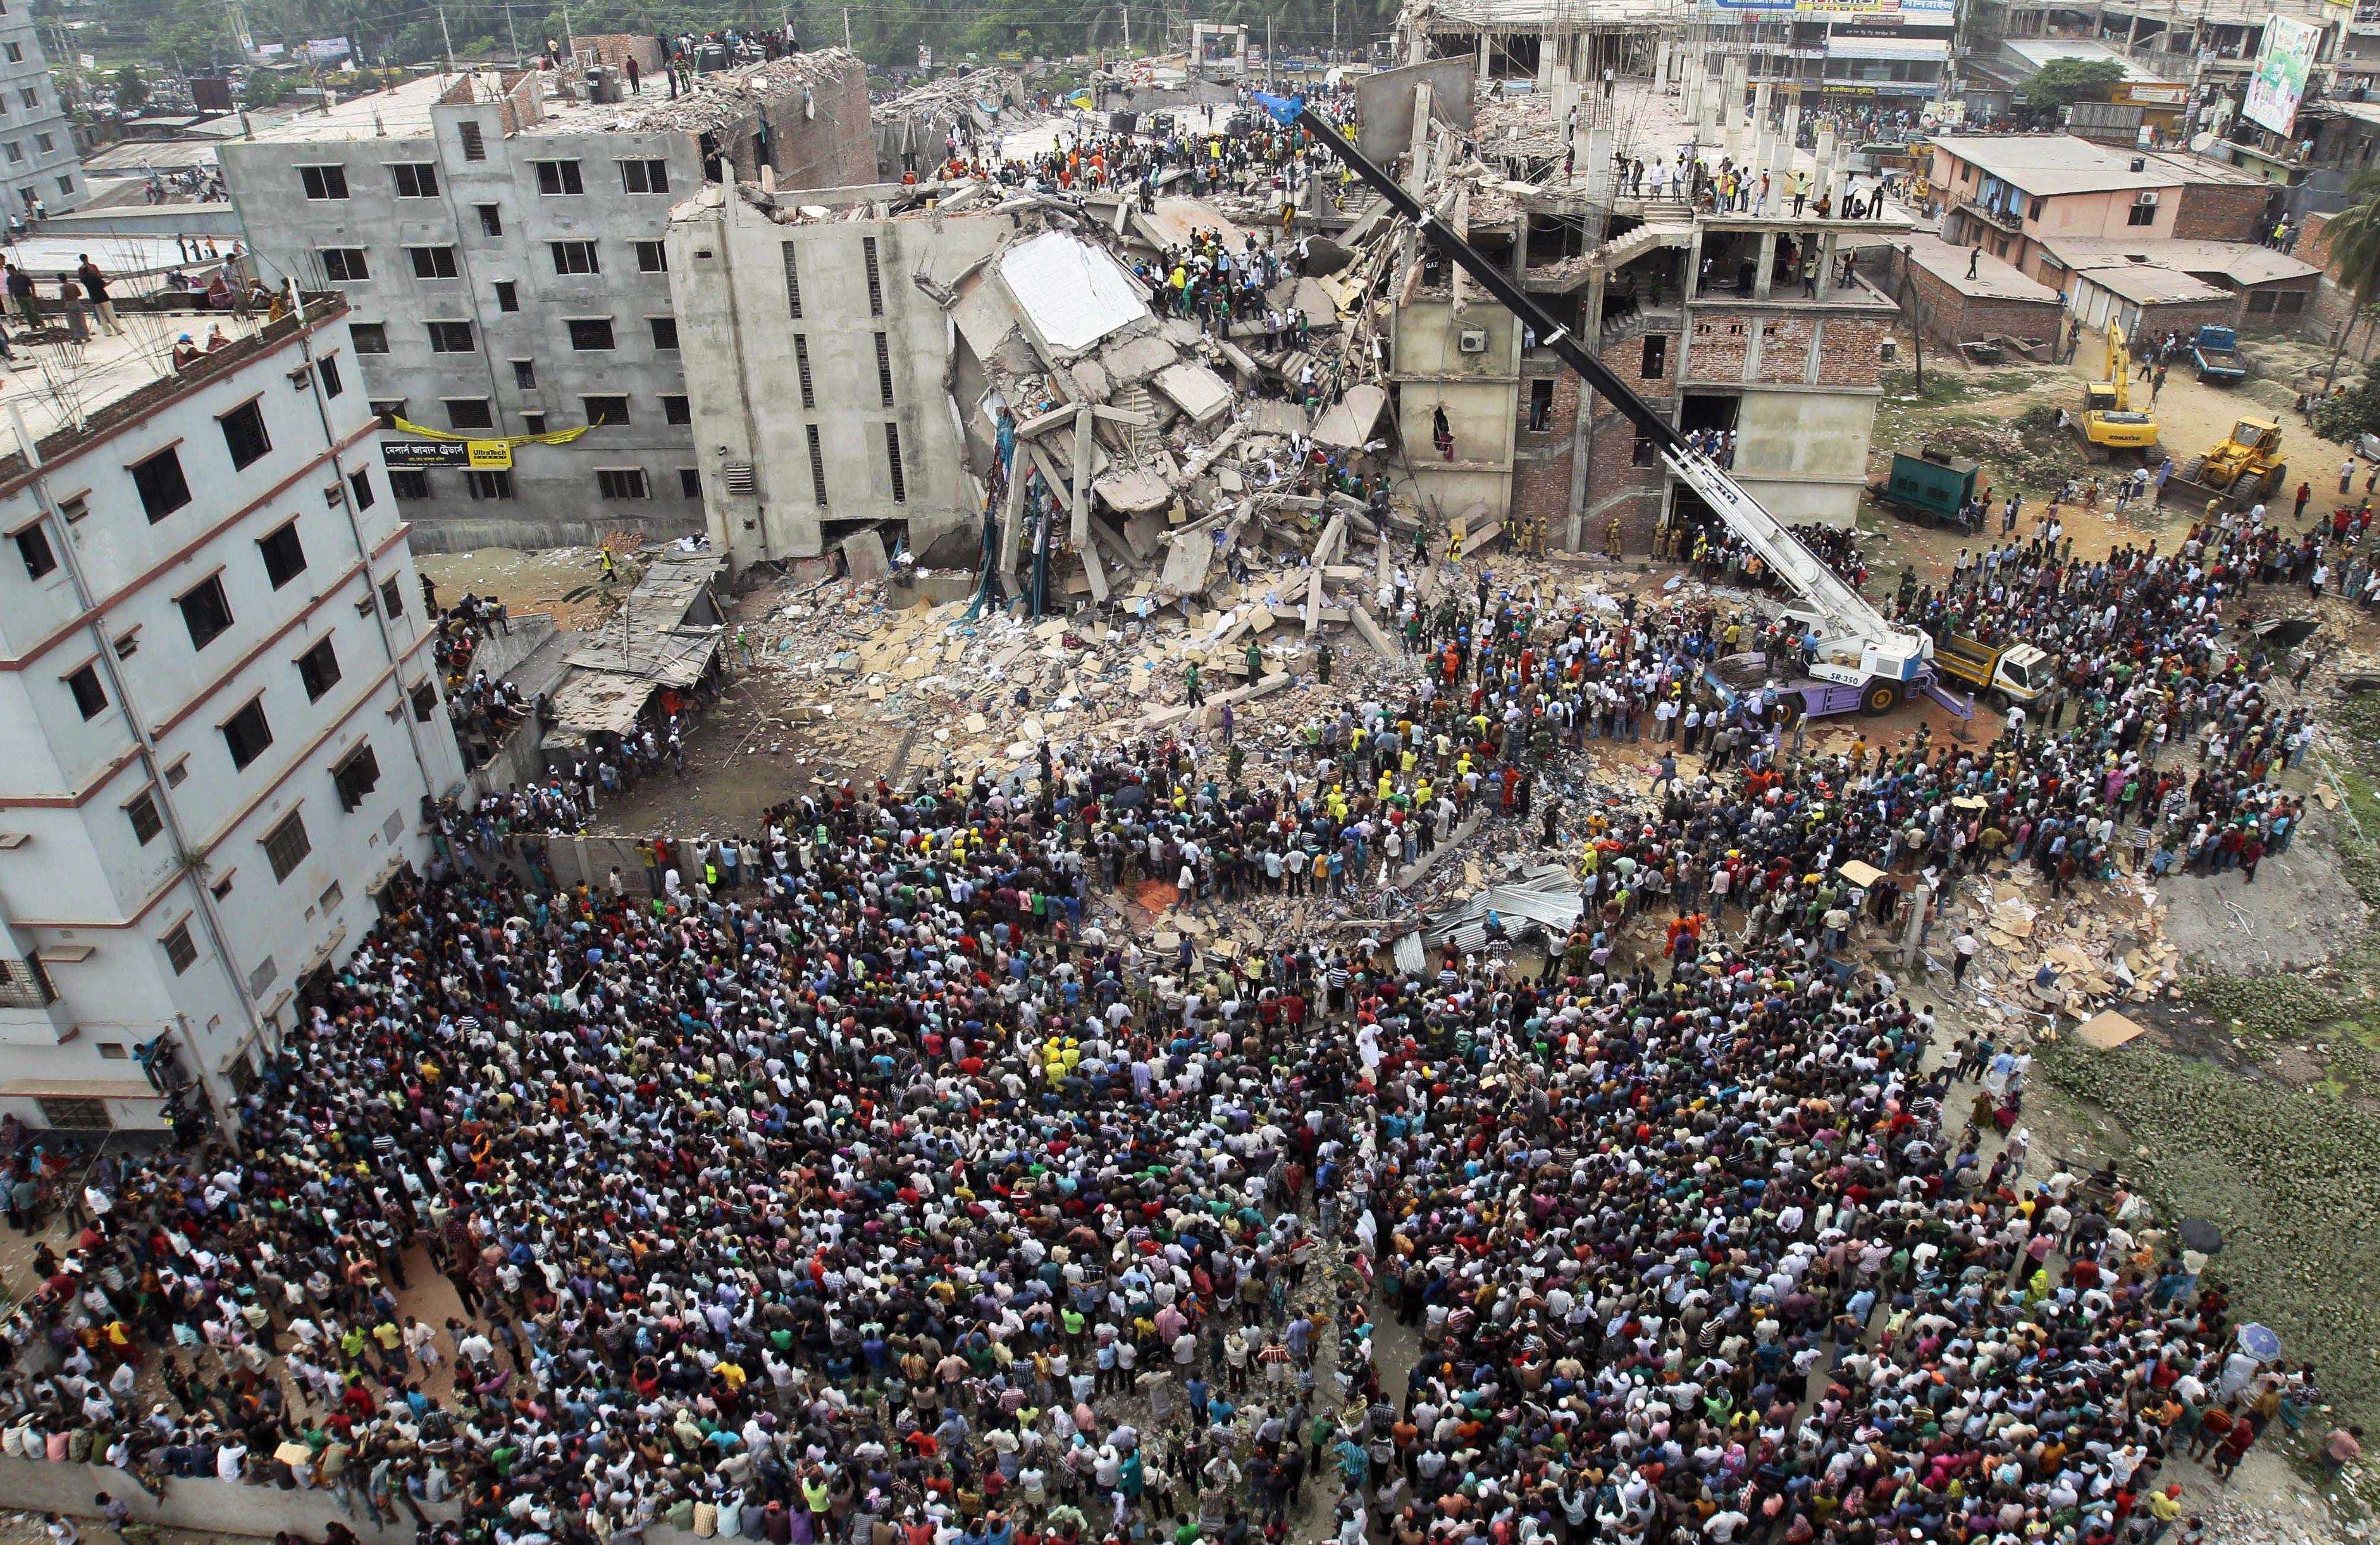 Rana Plaza collapsed on April 24, 2013.